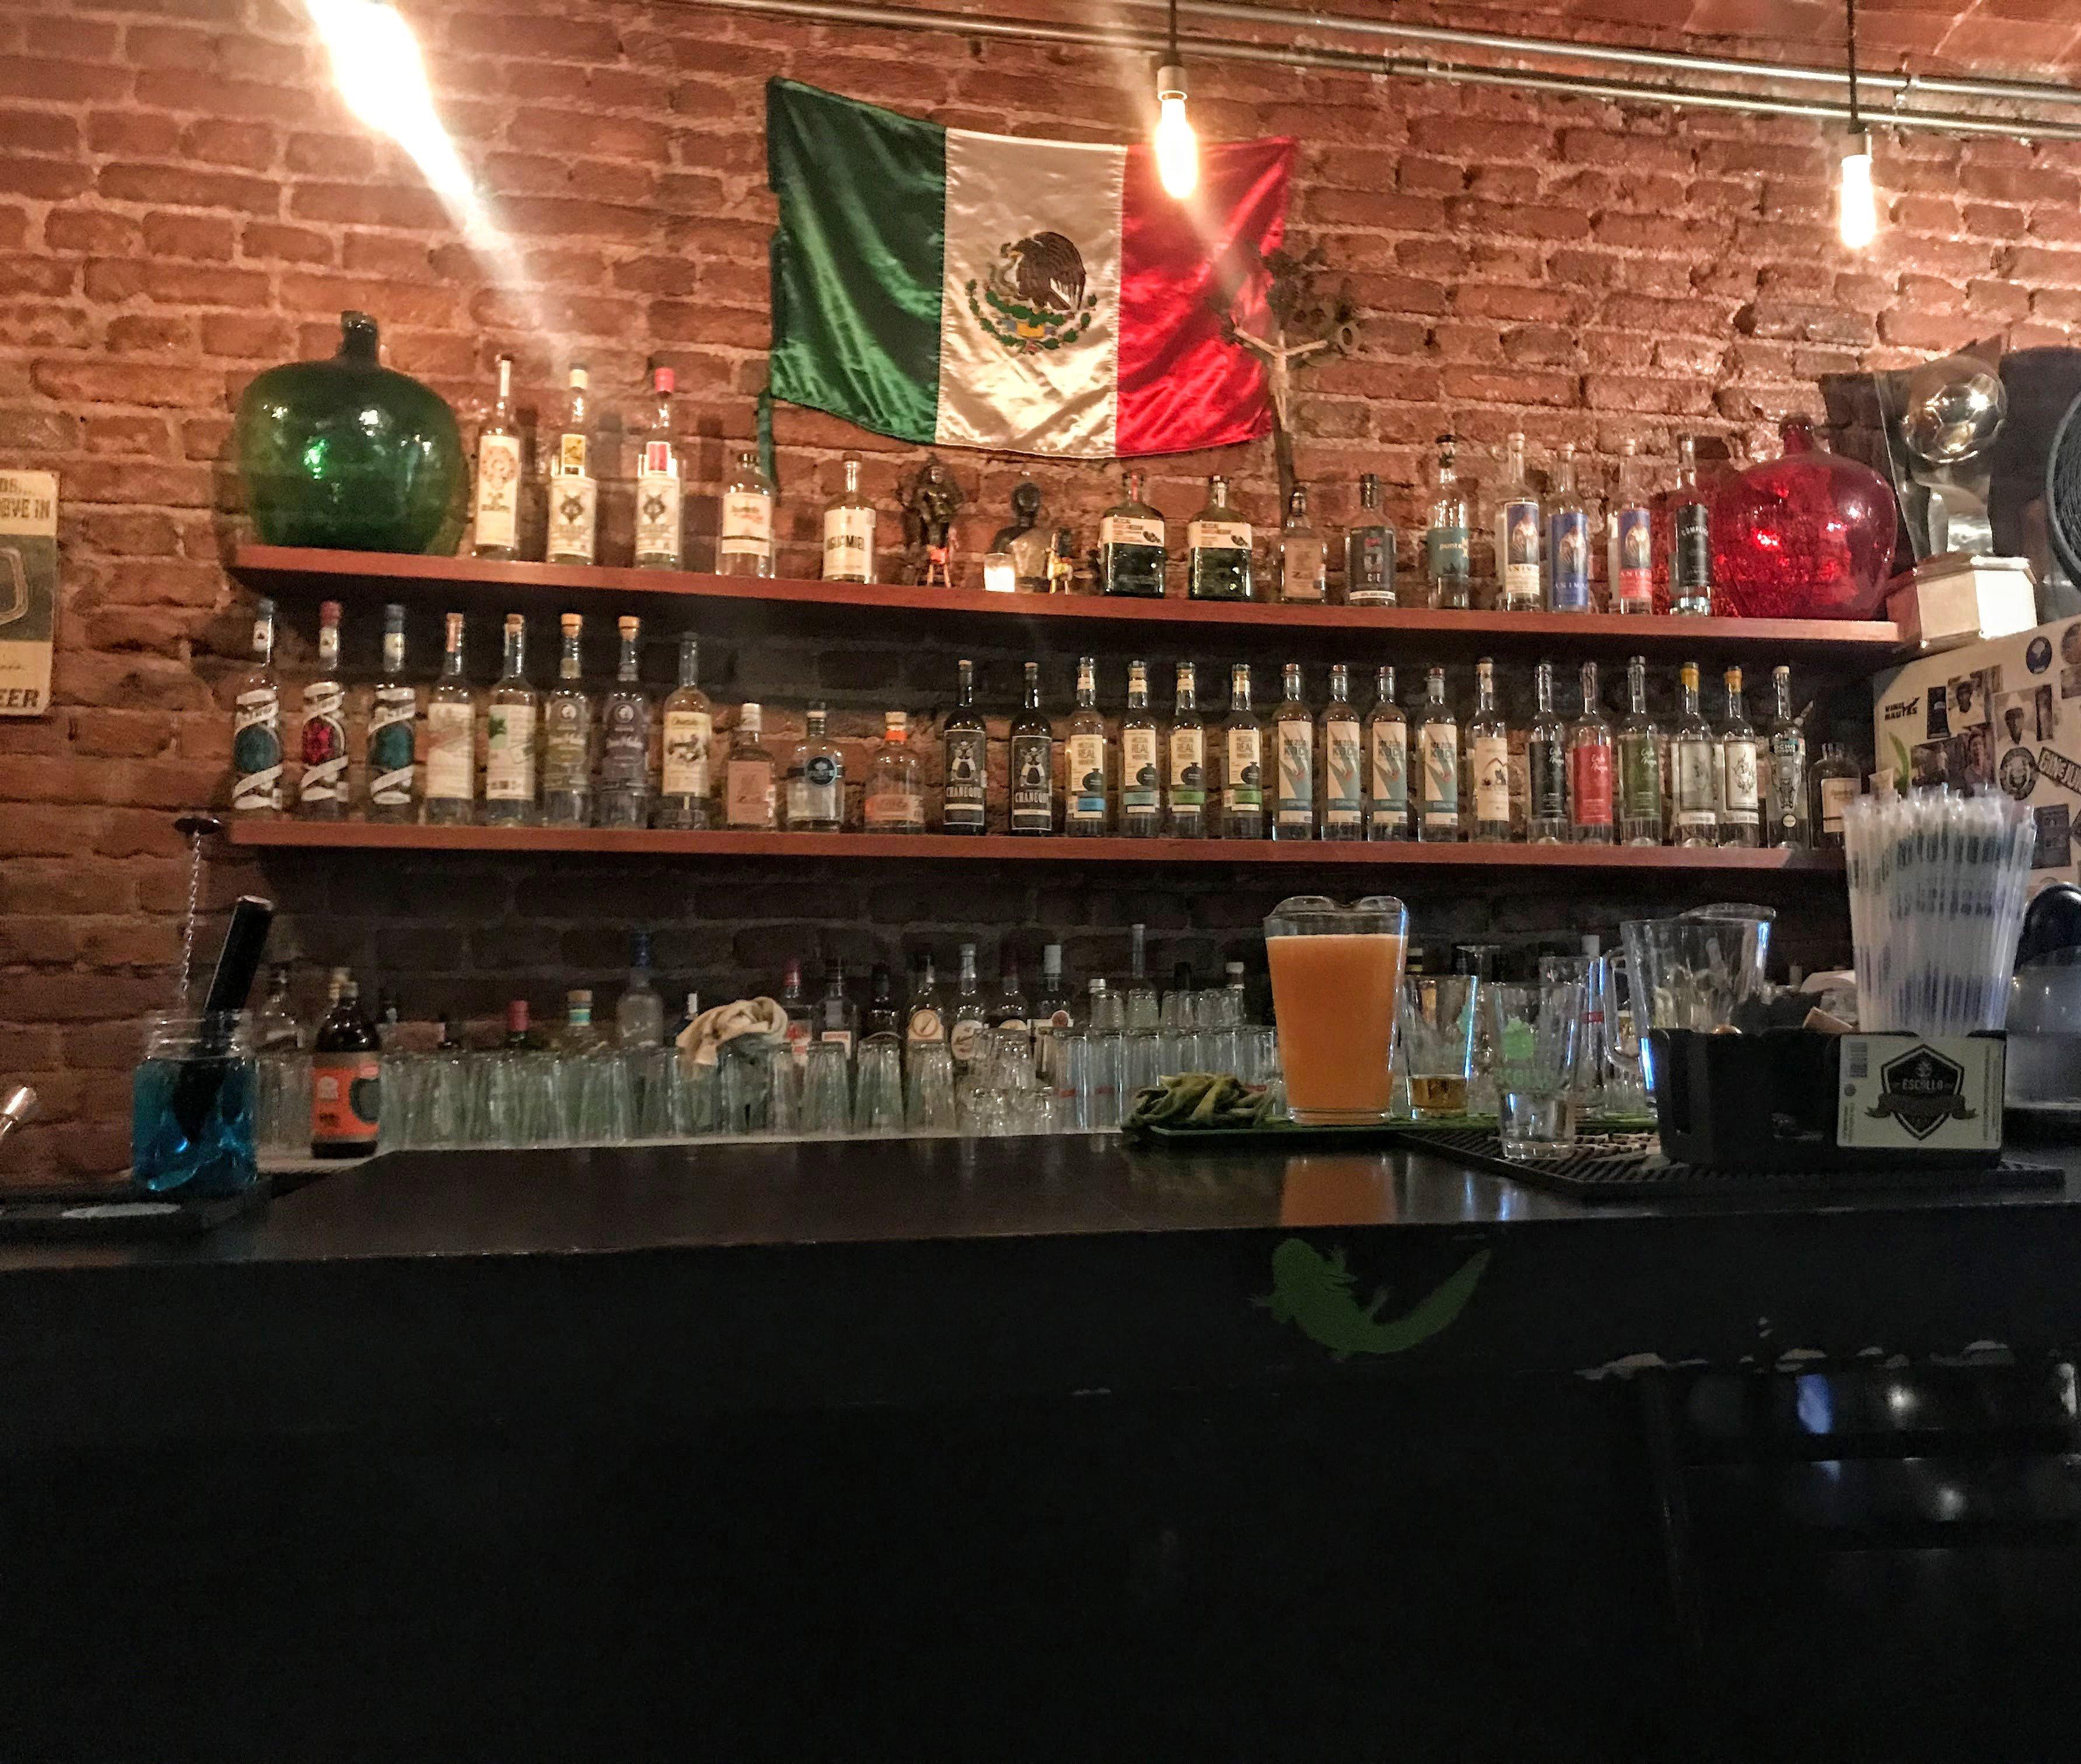 Escollo Brewery in Mexico City